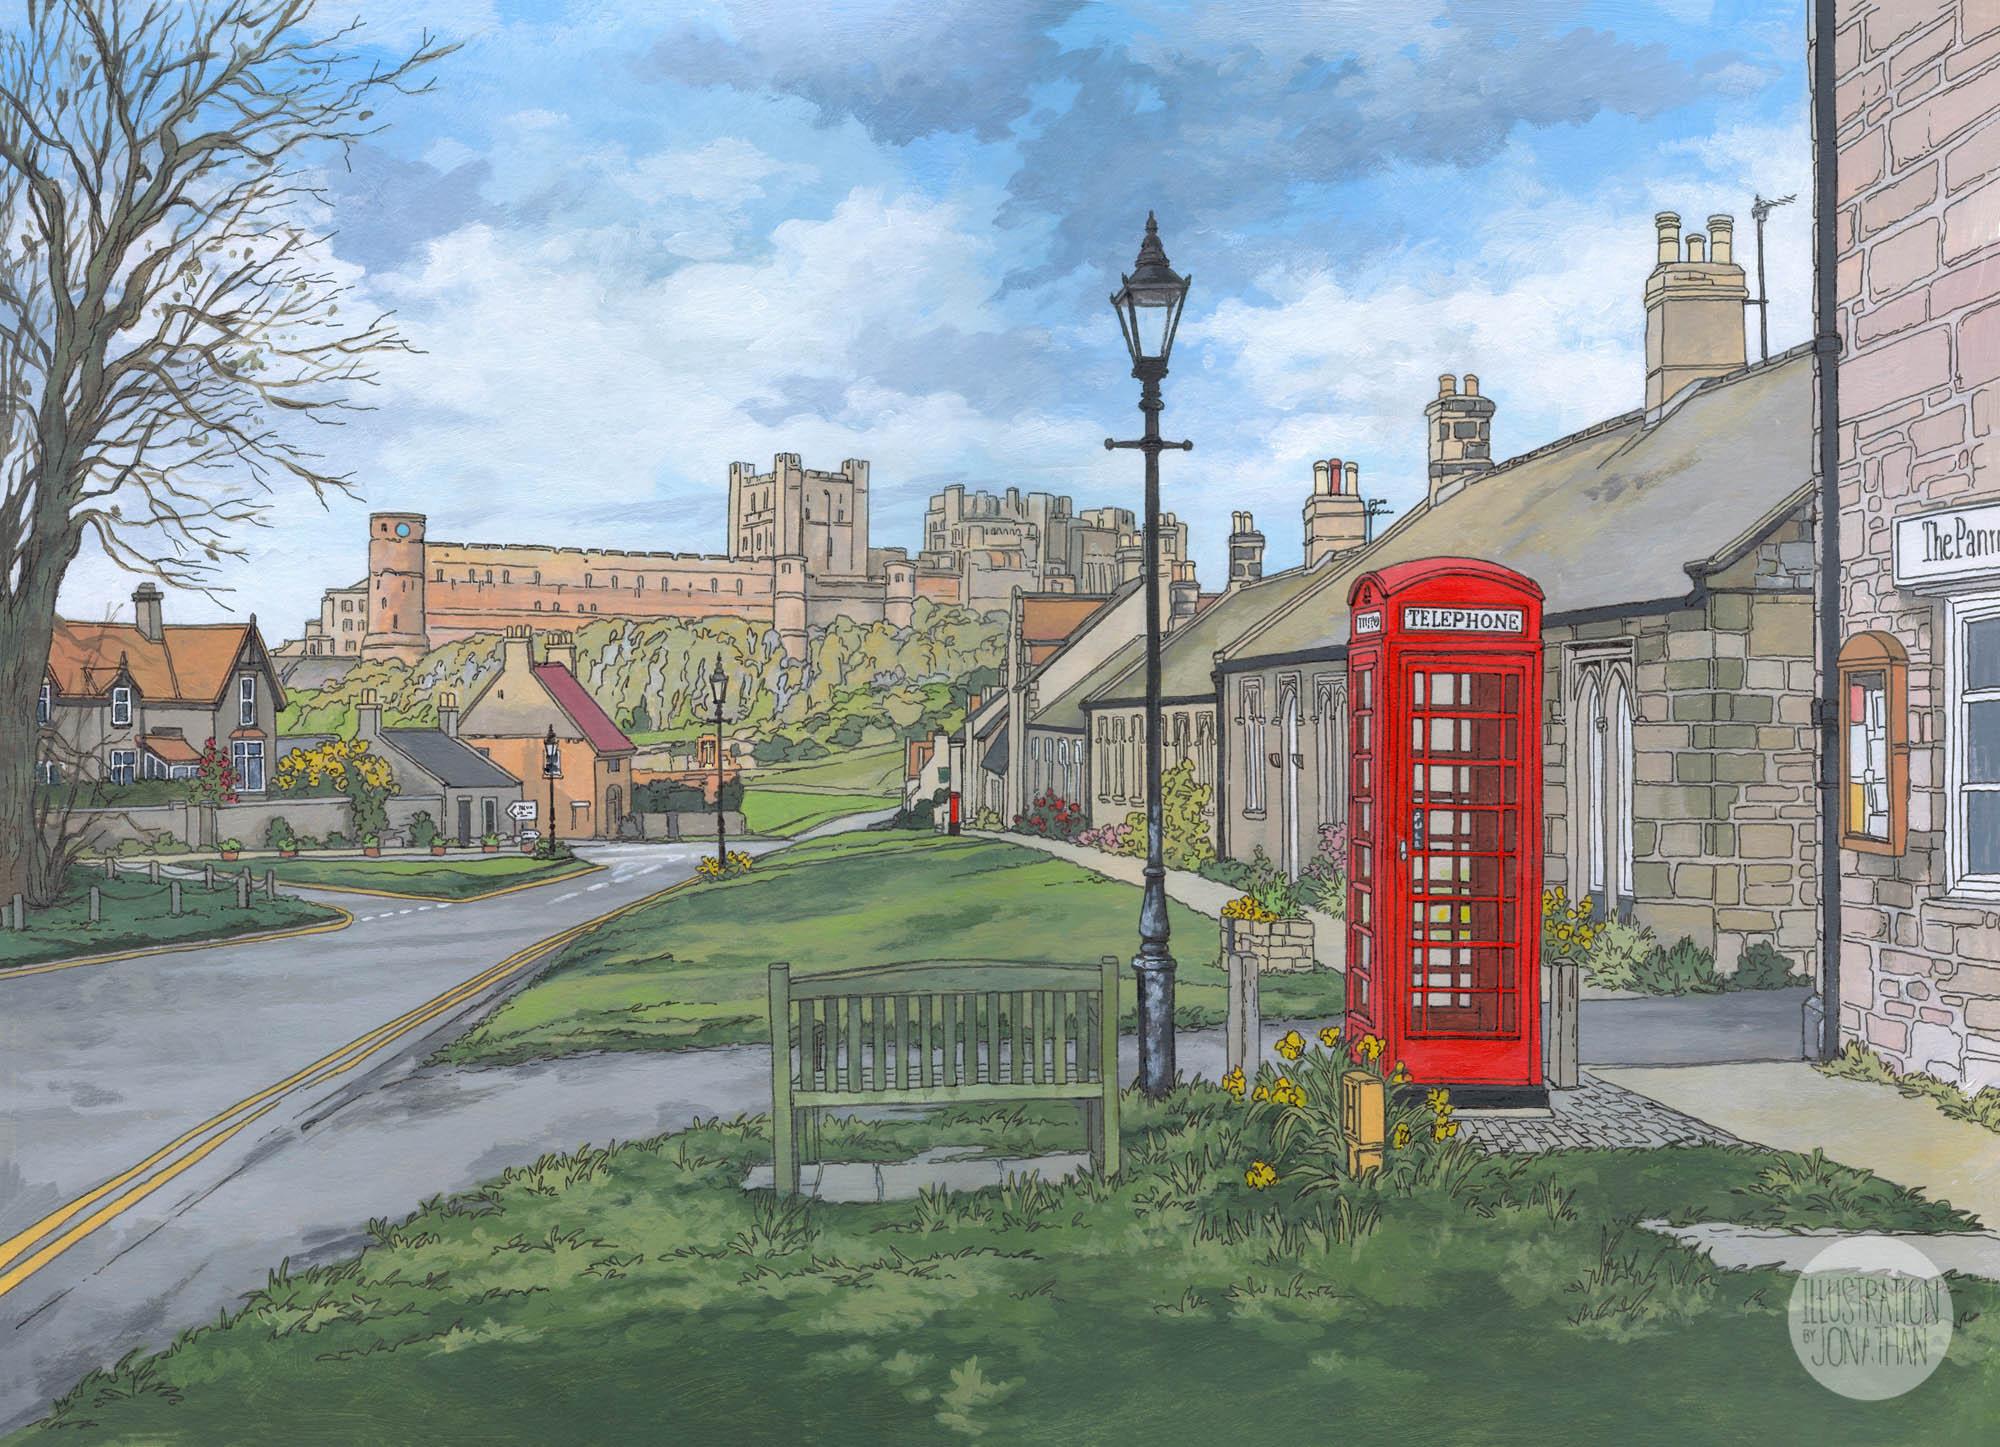 Bamburgh - Illustration by Jonathan Chapman